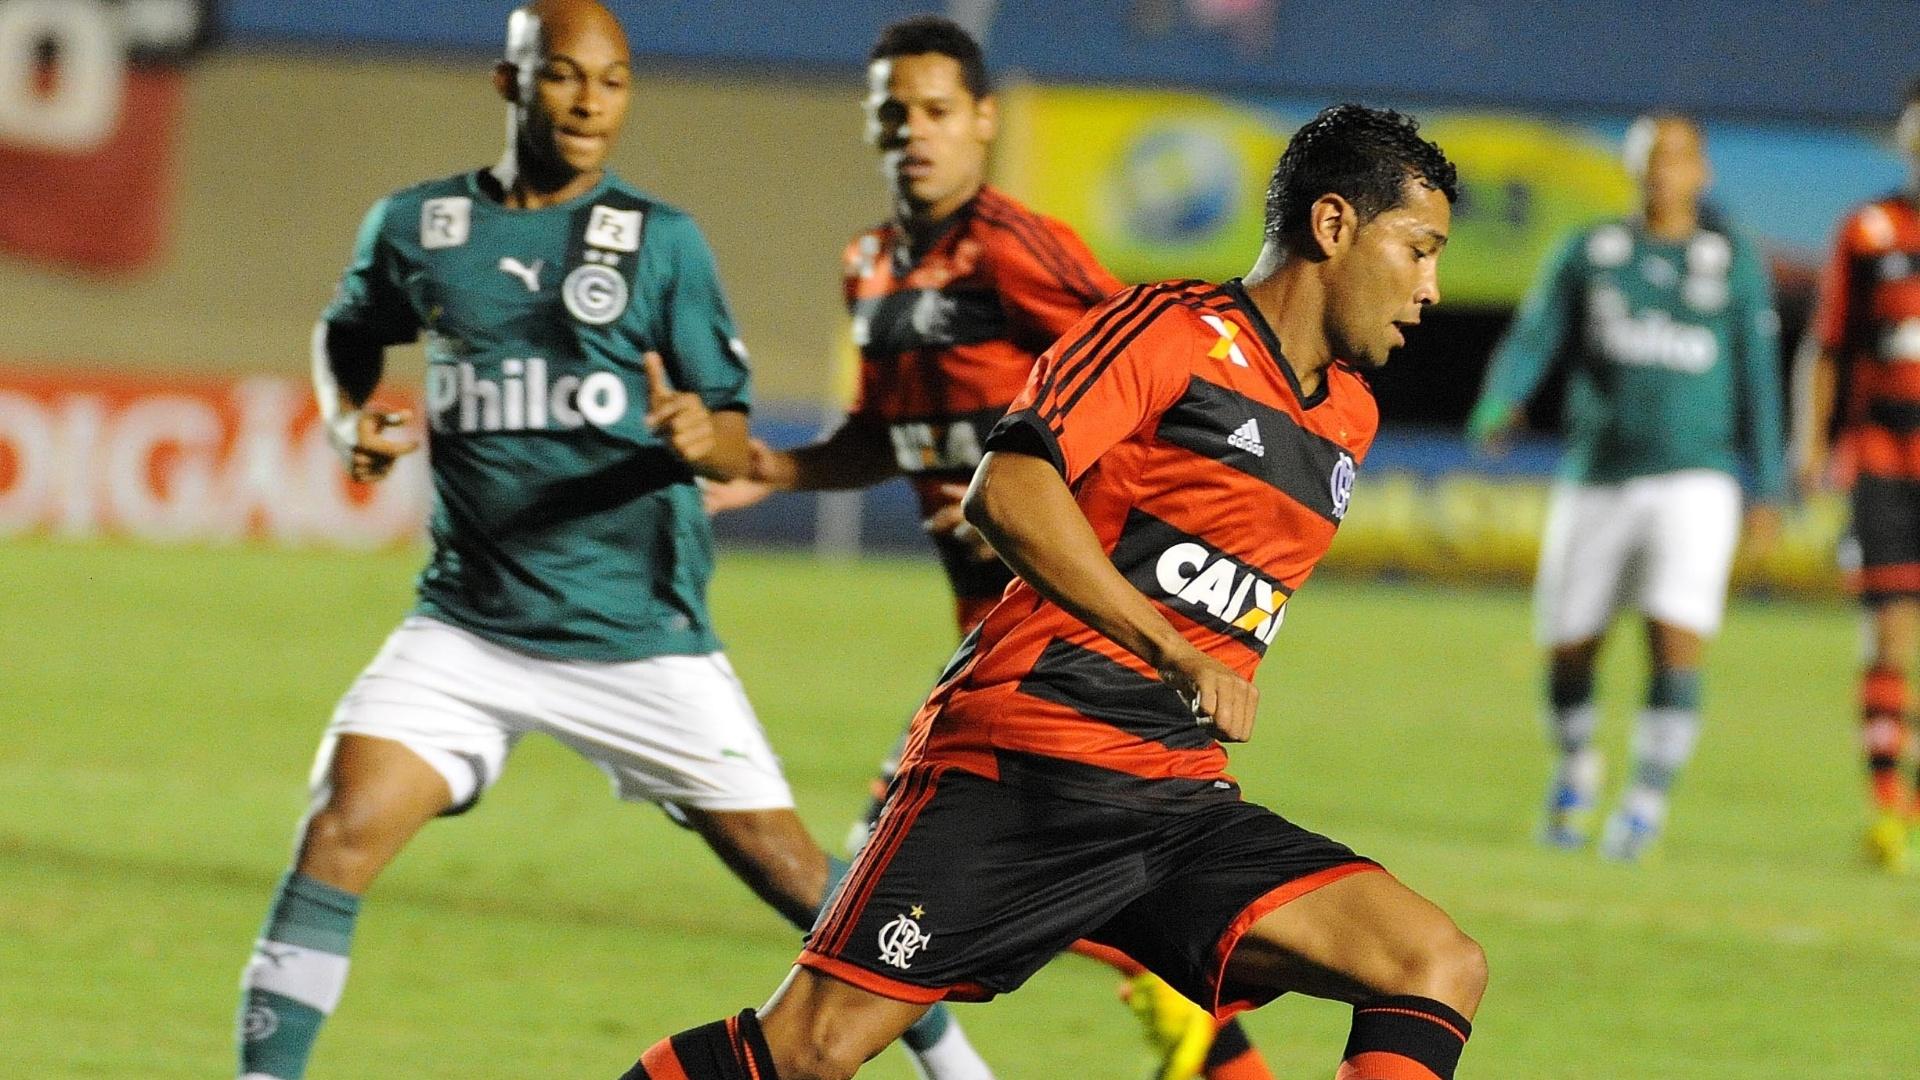 14.ago.2013 - André Santos domina a bola durante a partida entre Goiás e Flamengo no Serra Dourada